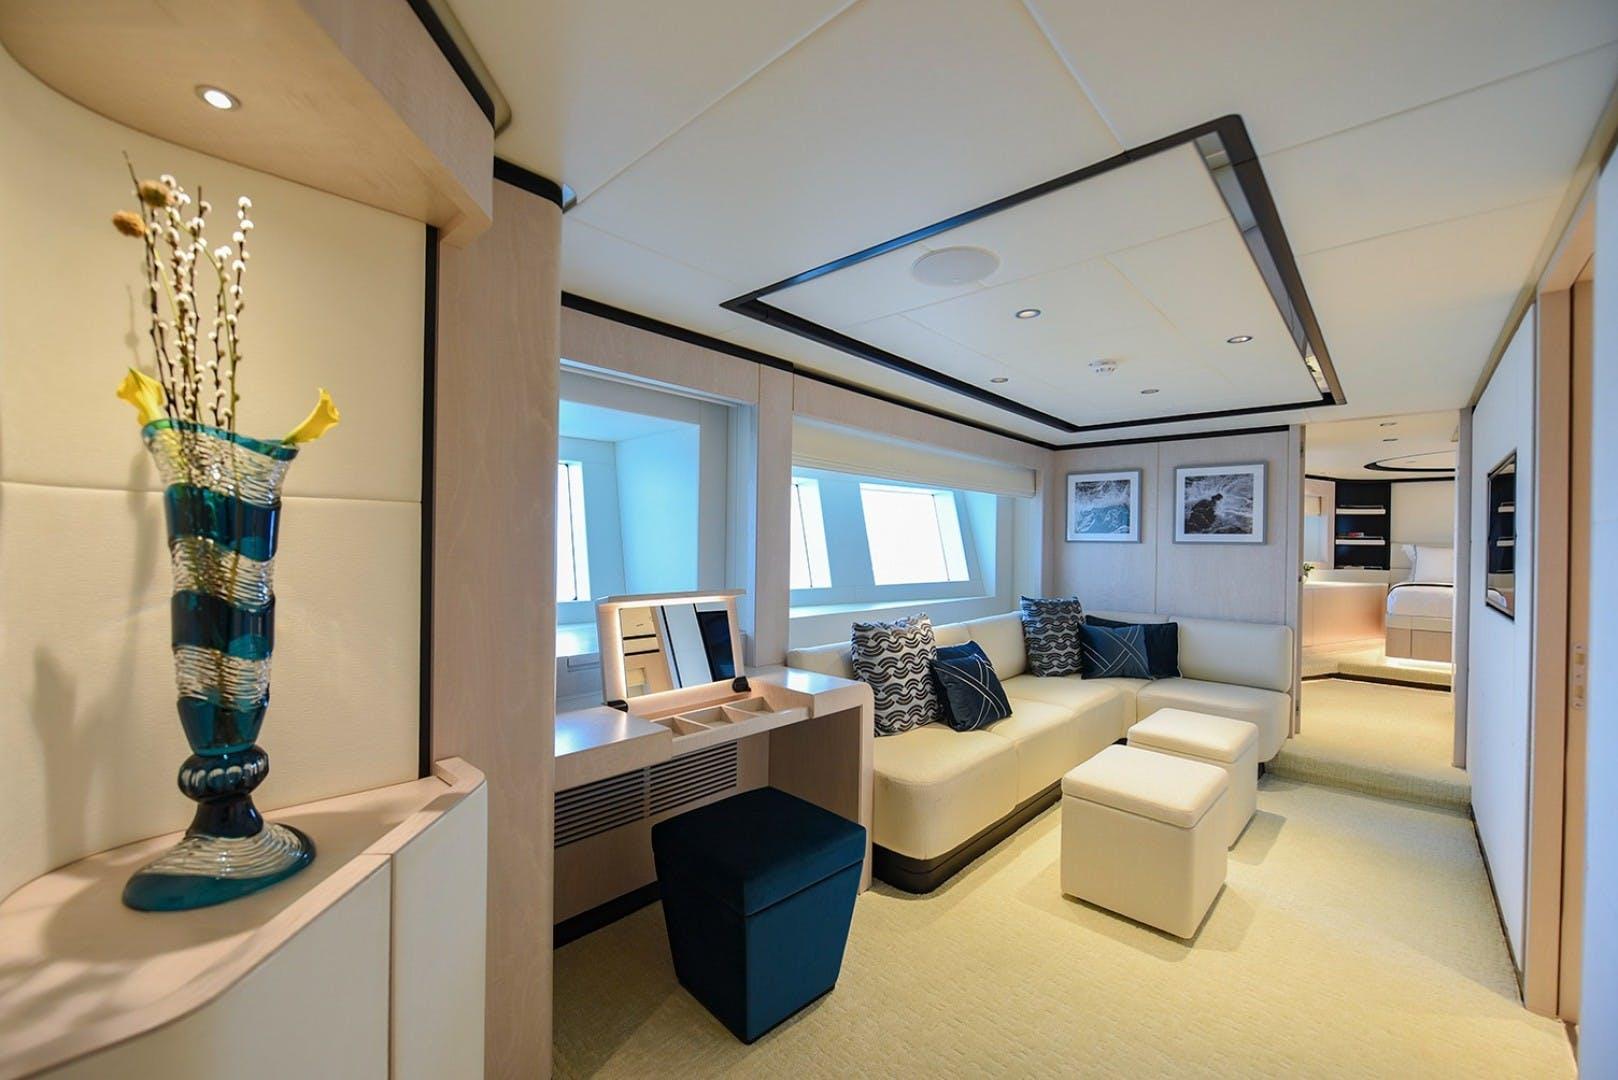 2022 Majesty Yachts 120' Raised Pilothouse MAJESTY 120 | Picture 2 of 39